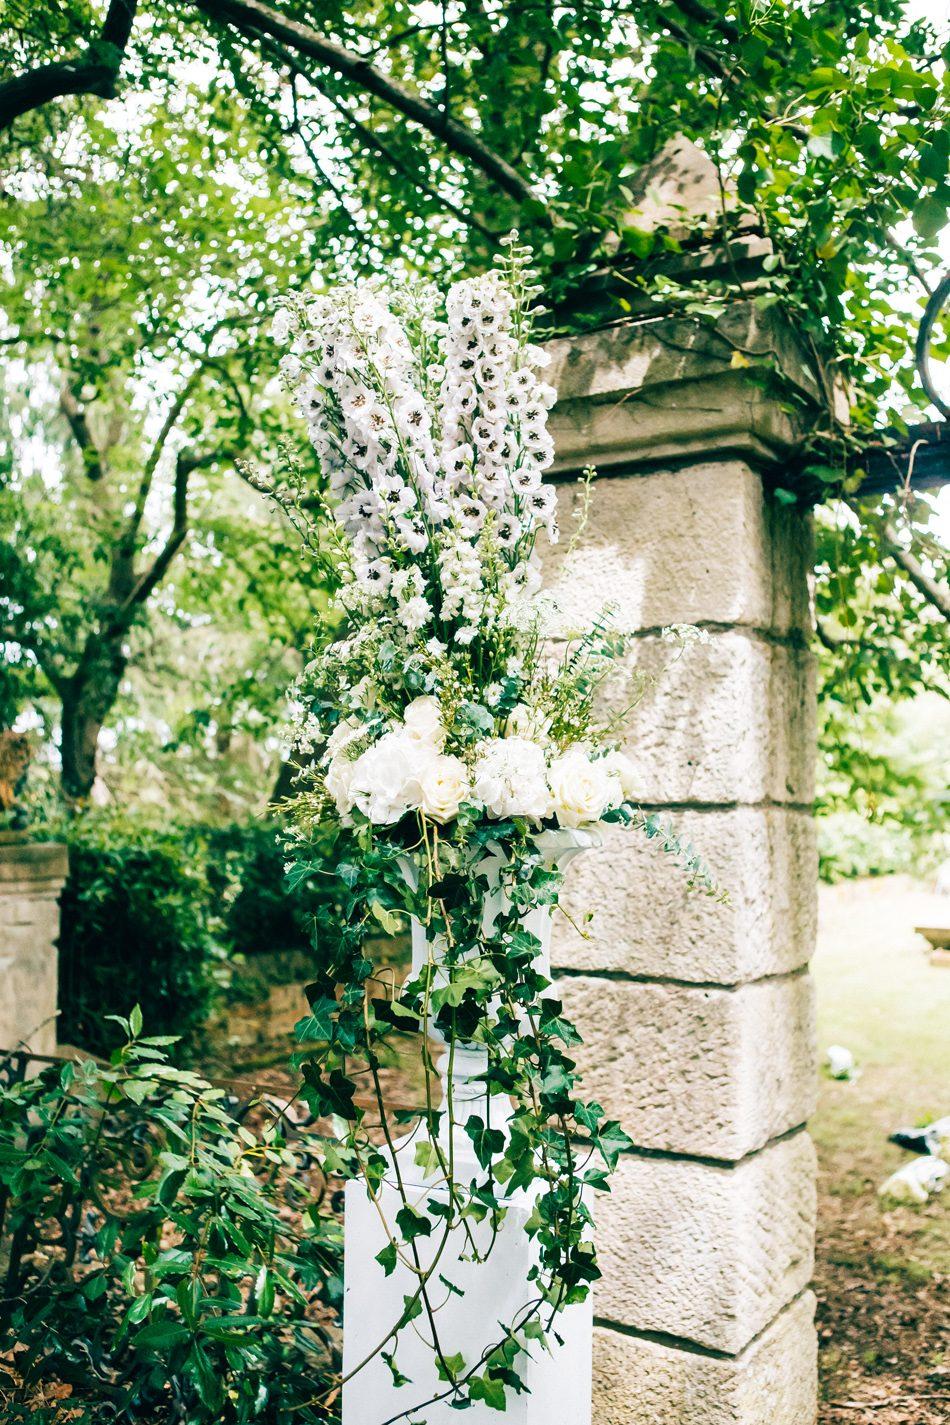 ruban collectif photographe landes france pays basque papeterie mariage fleuriste aquitaine wedding photography fleurs blanches liere